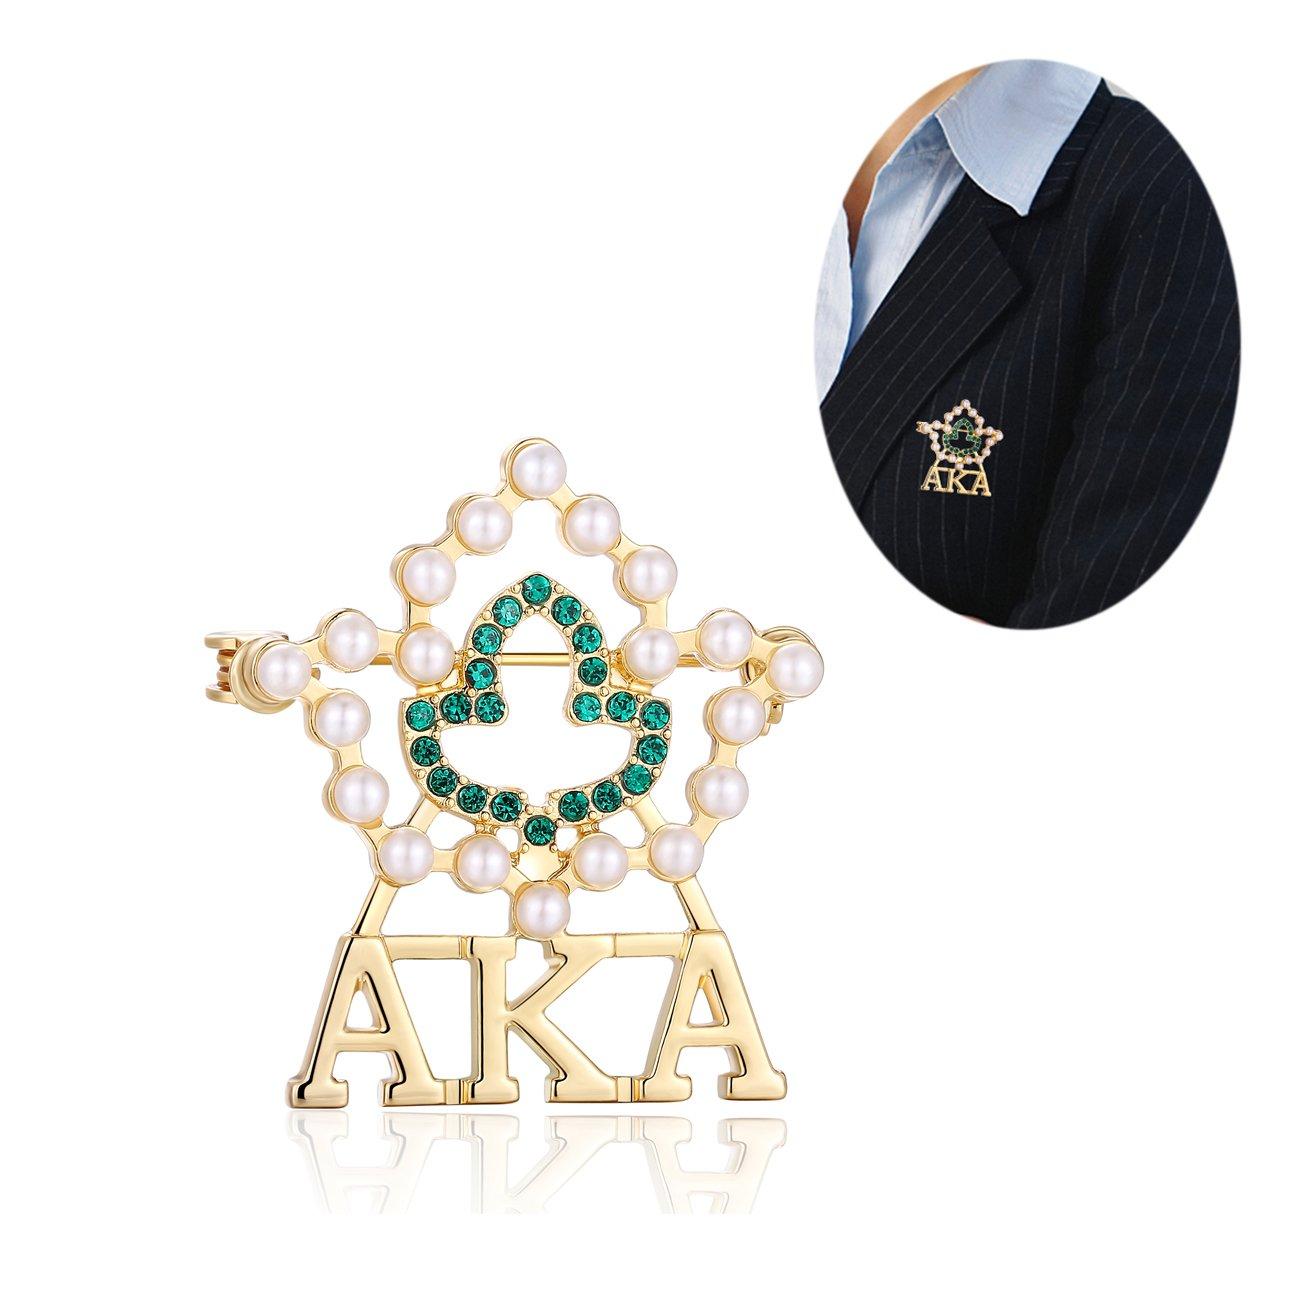 KINGSIN AKA Sorority Gifts, Vintage Crystal Pearl Brooch Gold Alpha Kappa Alpha Paraphernalia Graduation Gifts for Women